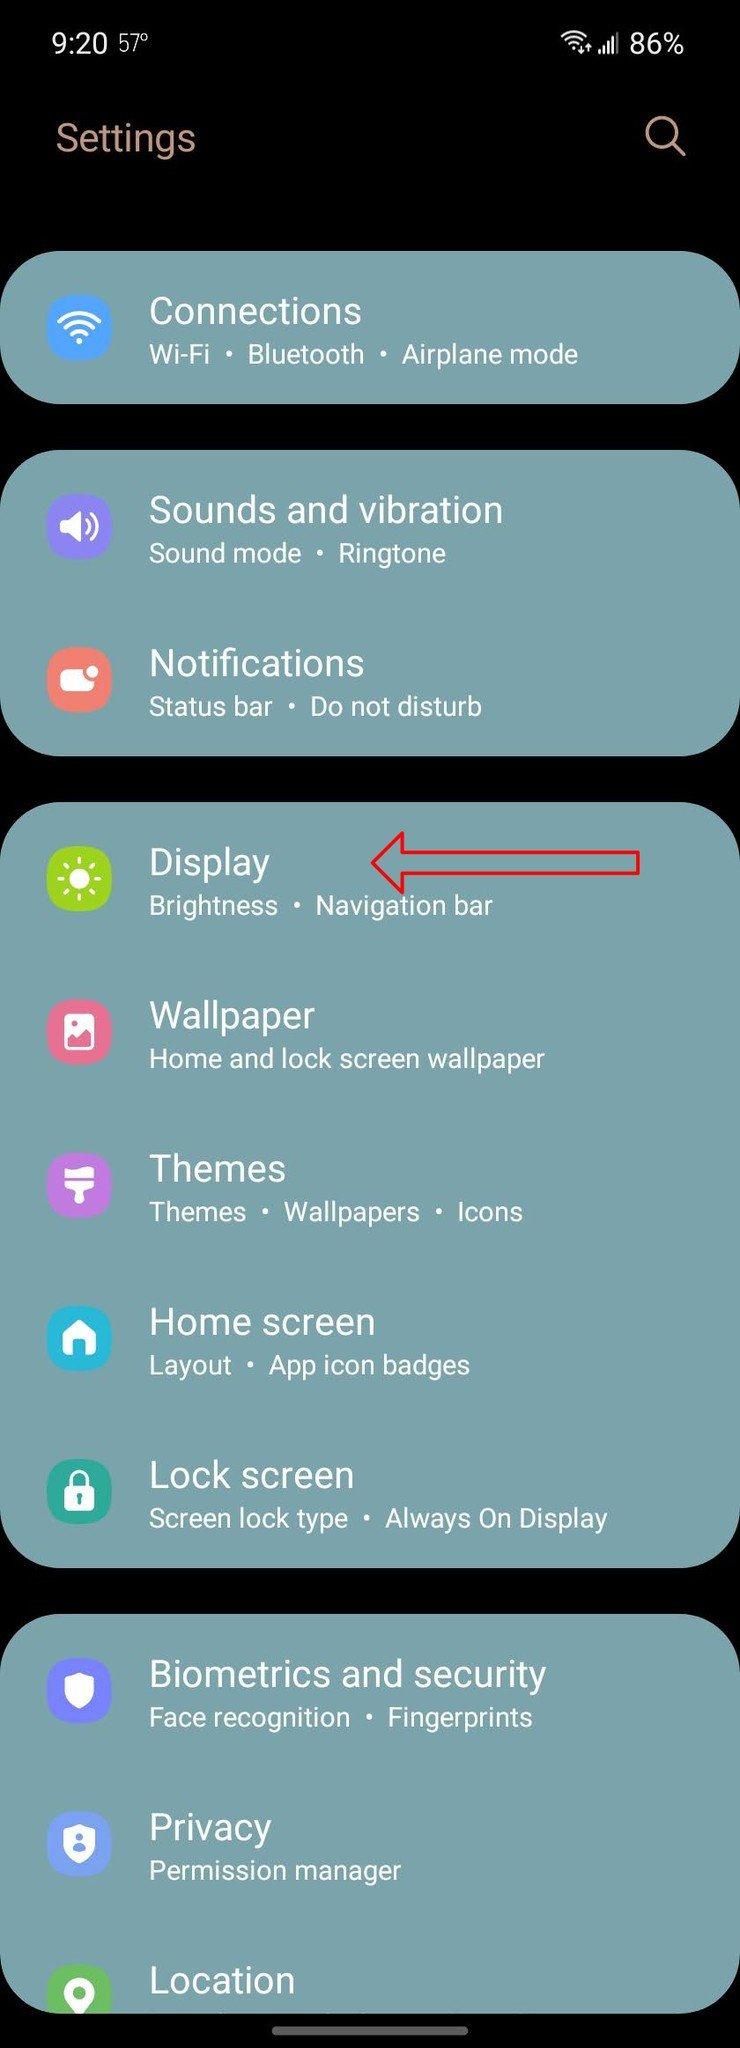 samsung-settings-screenshot-7.jpg